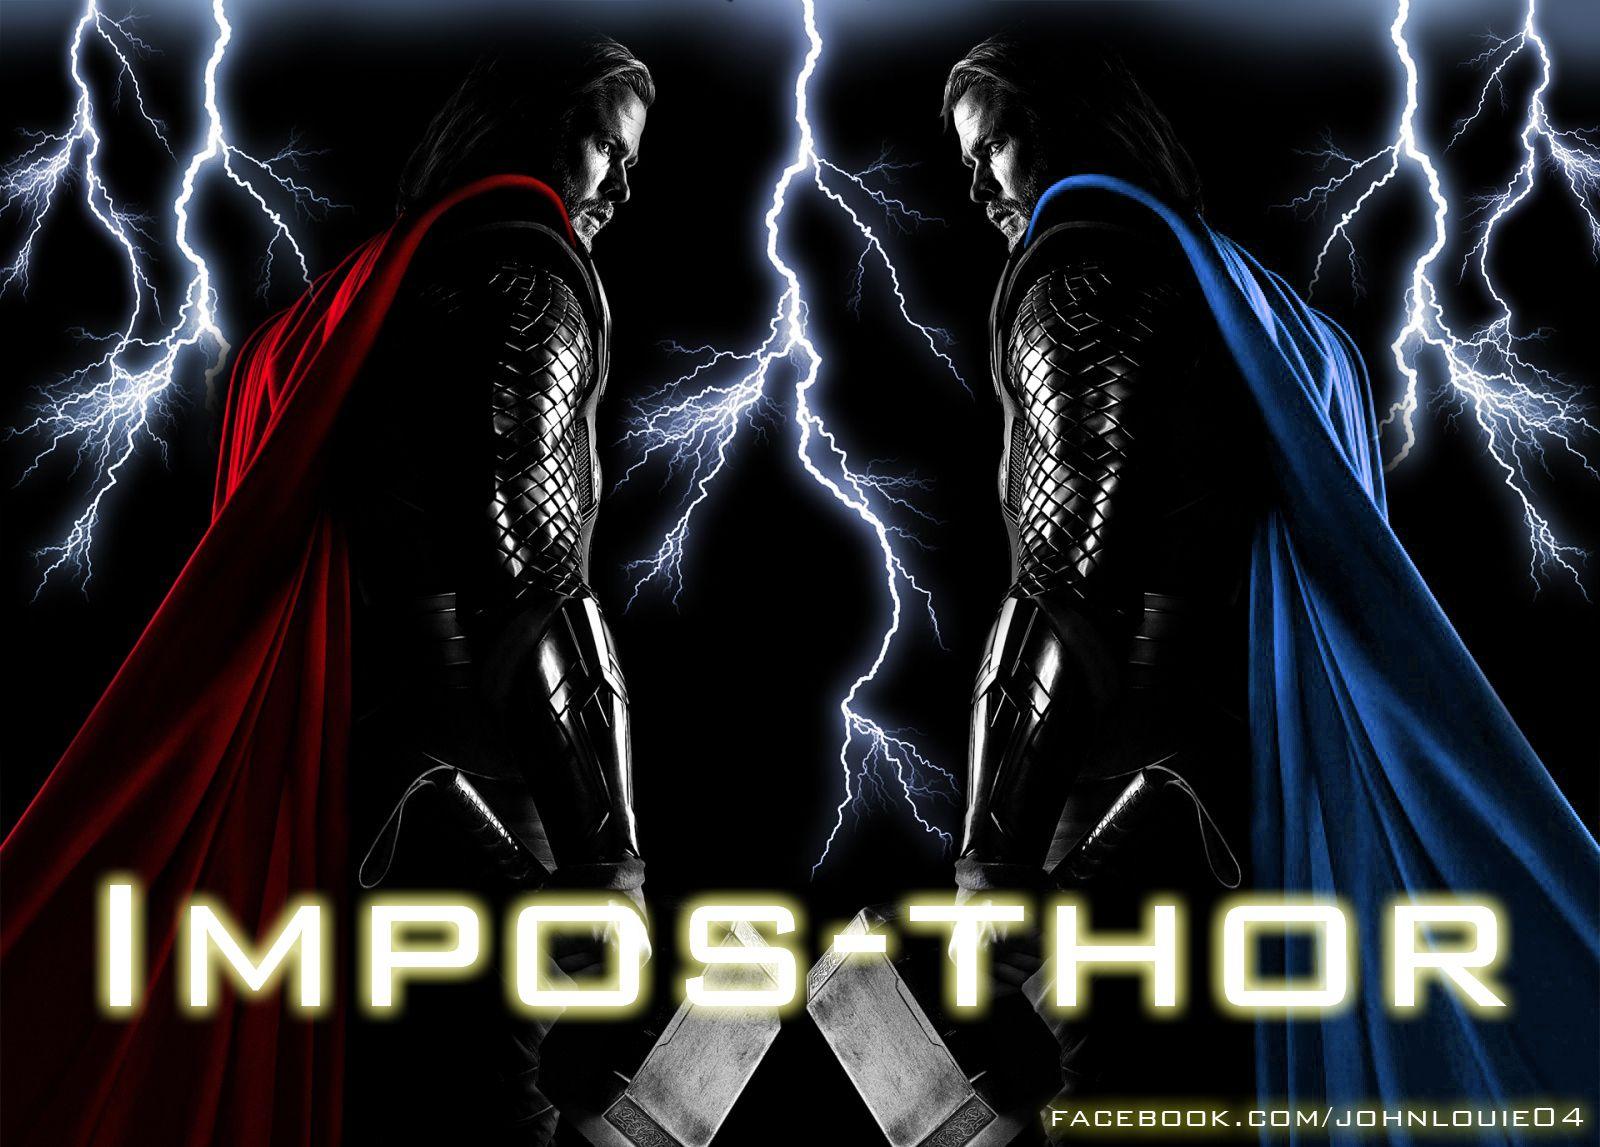 impostor - impos-thor hahaha